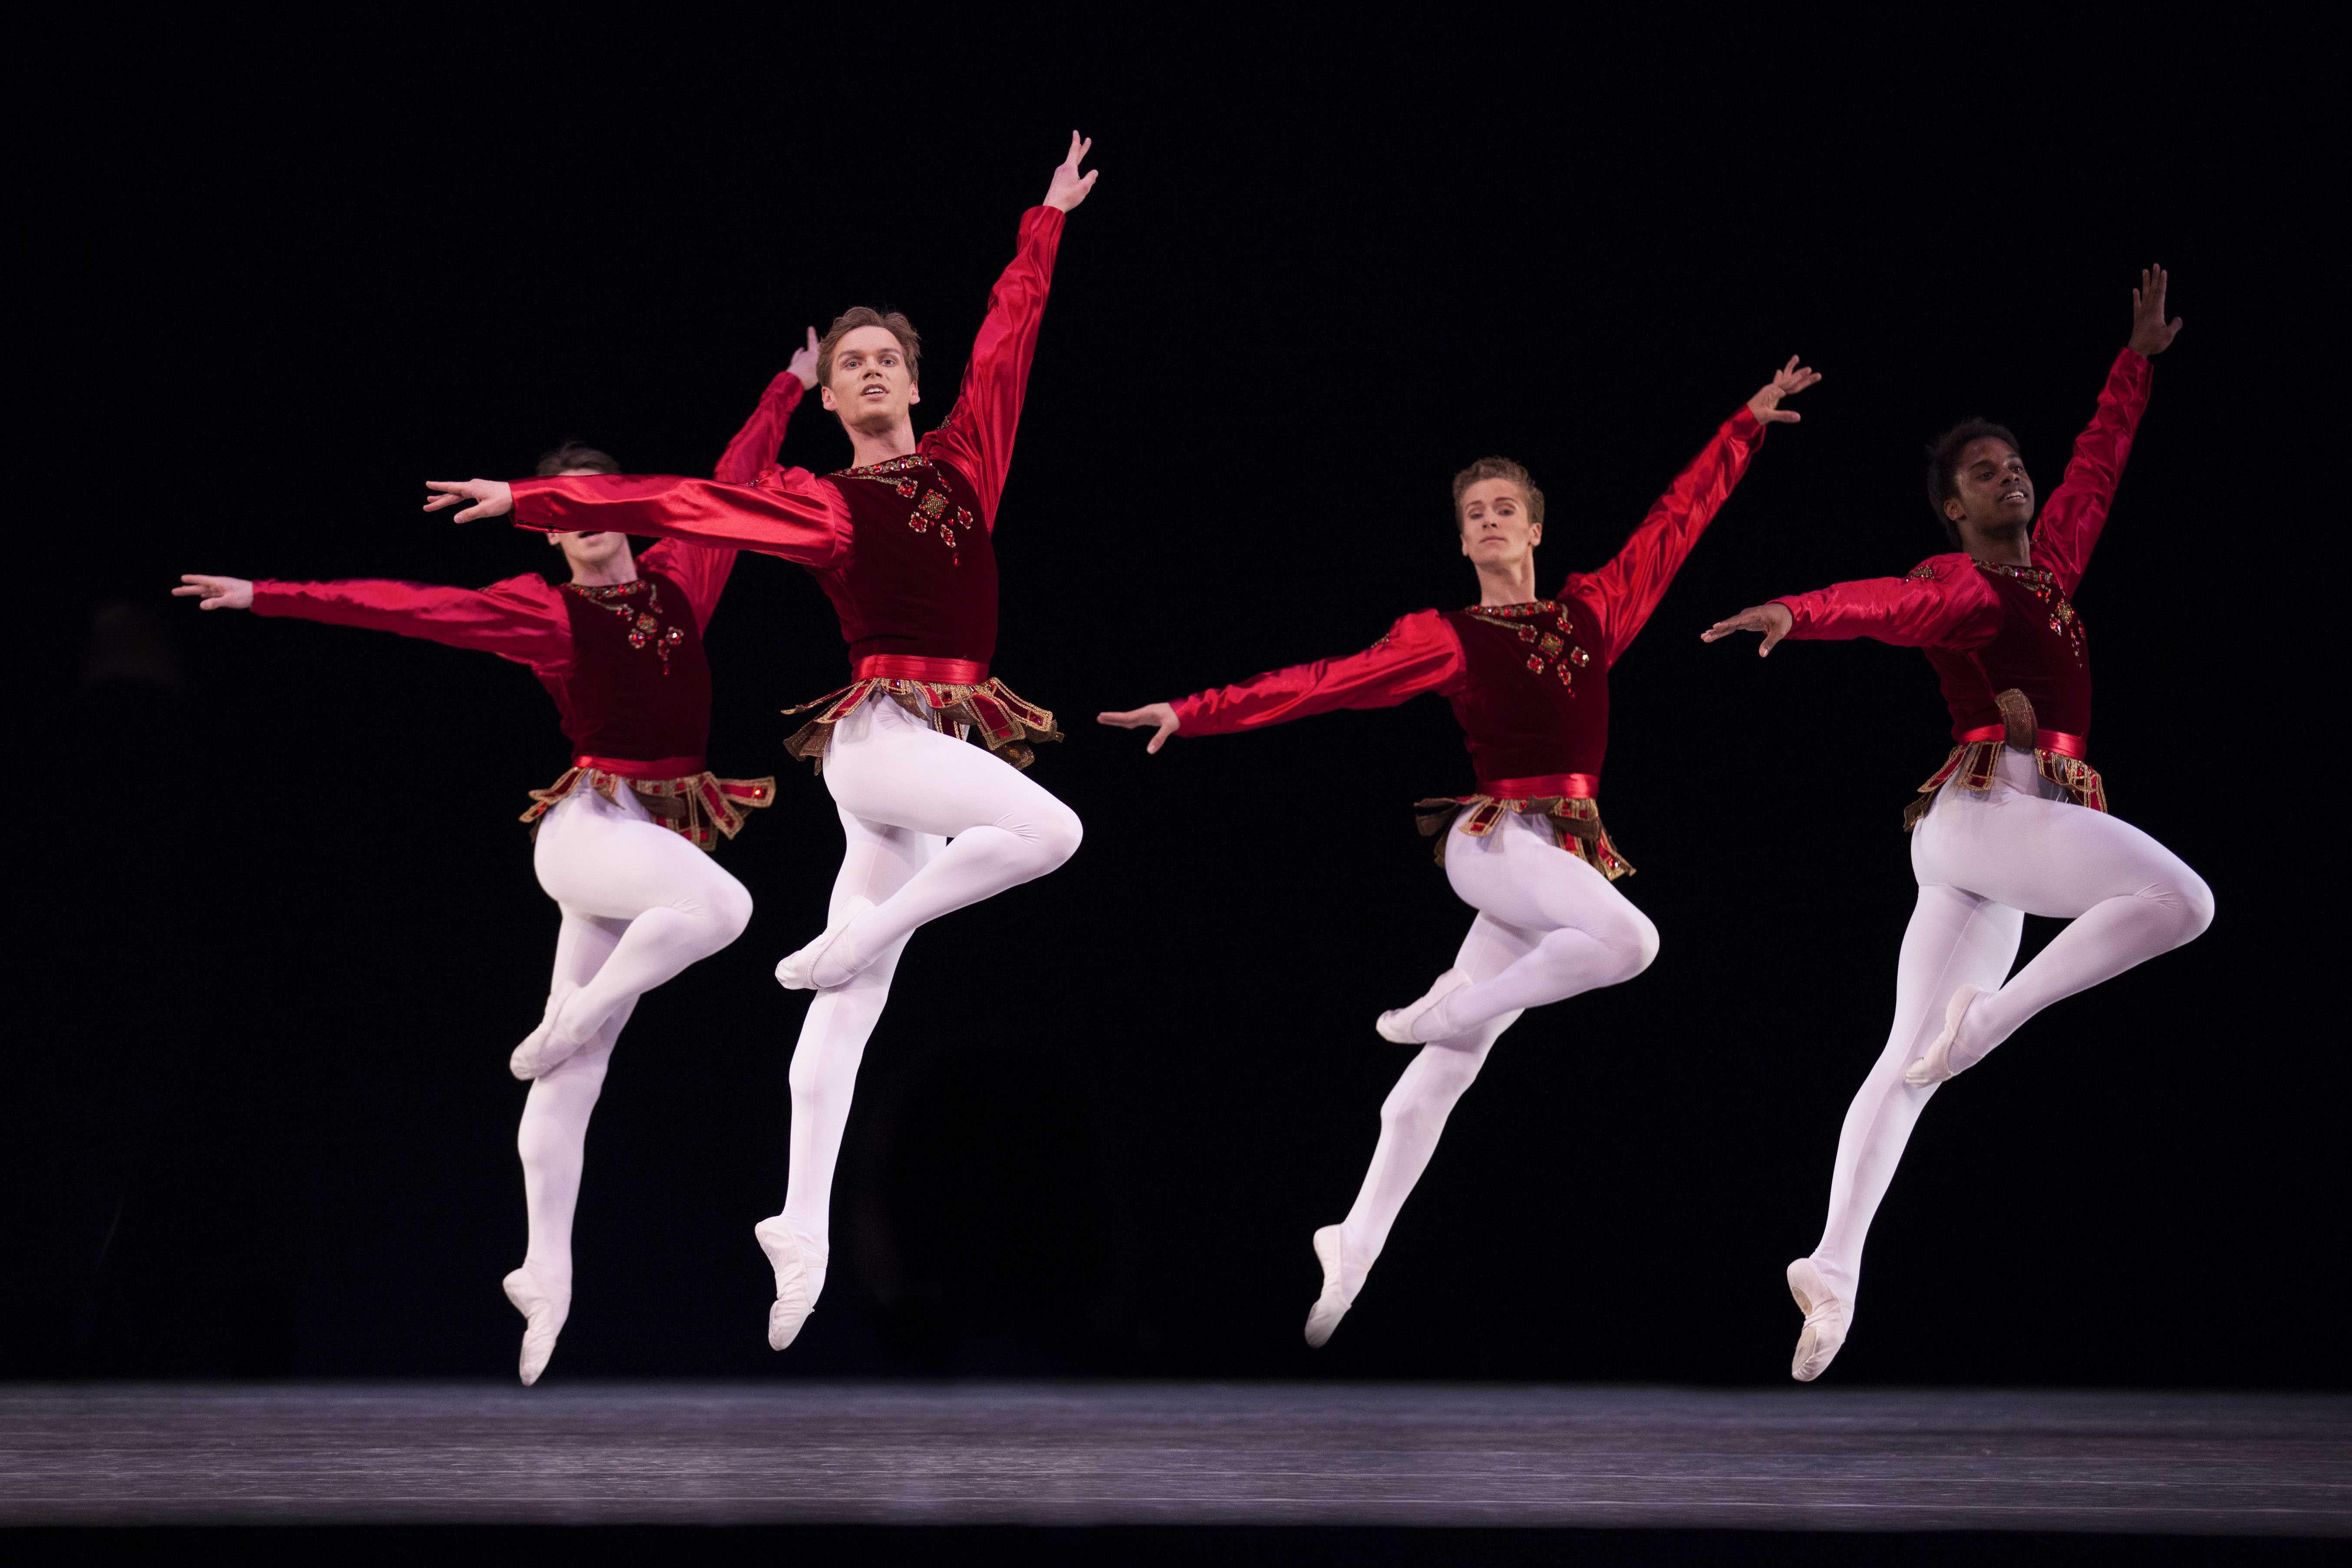 courtesy Ballet West